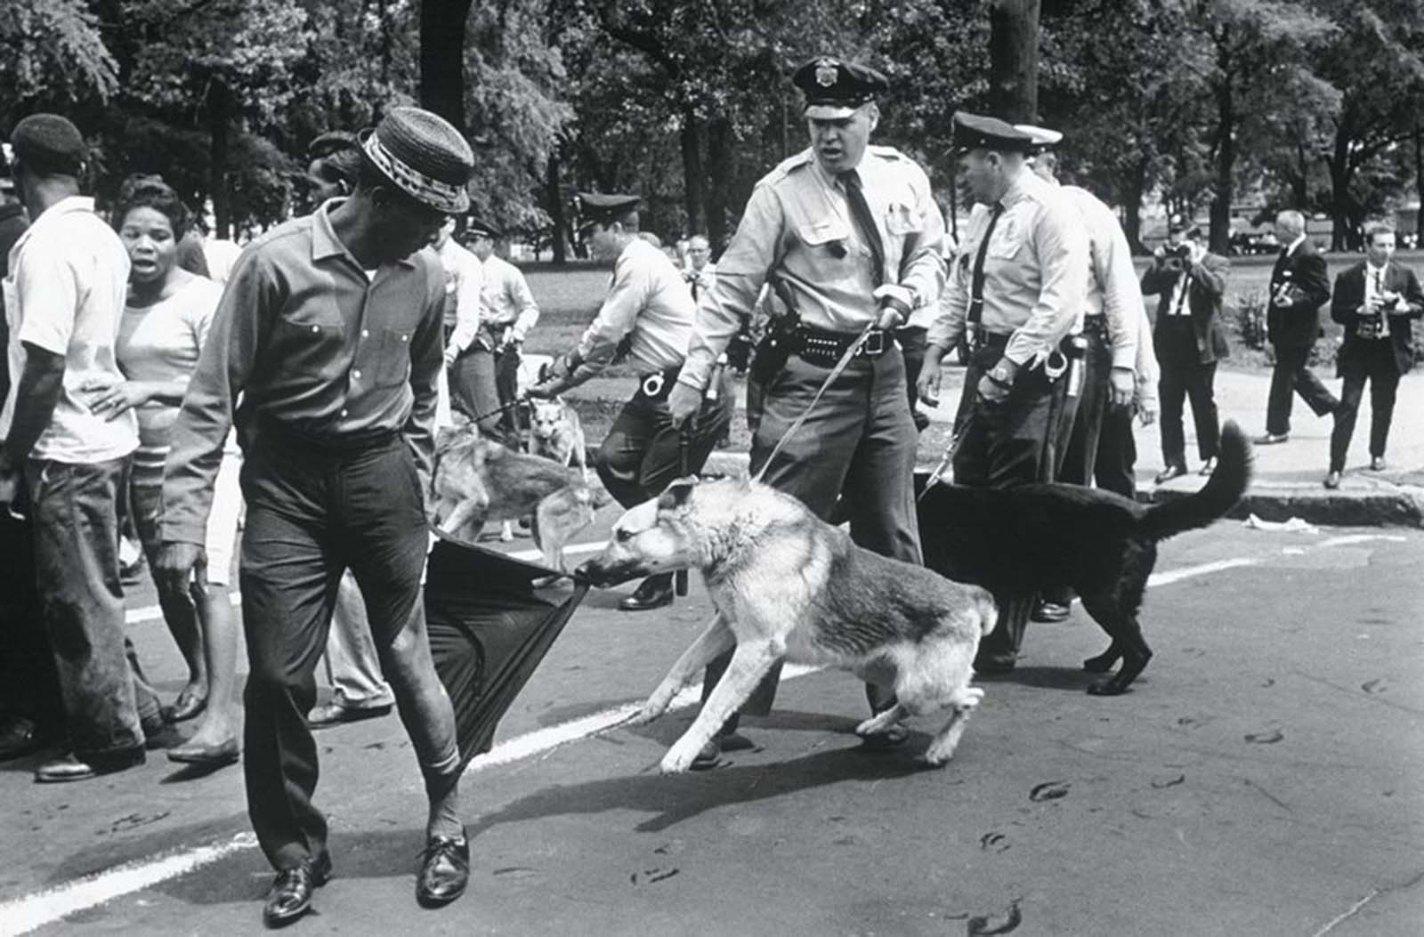 Birmingham, Alabama, Charles Moore, 1963